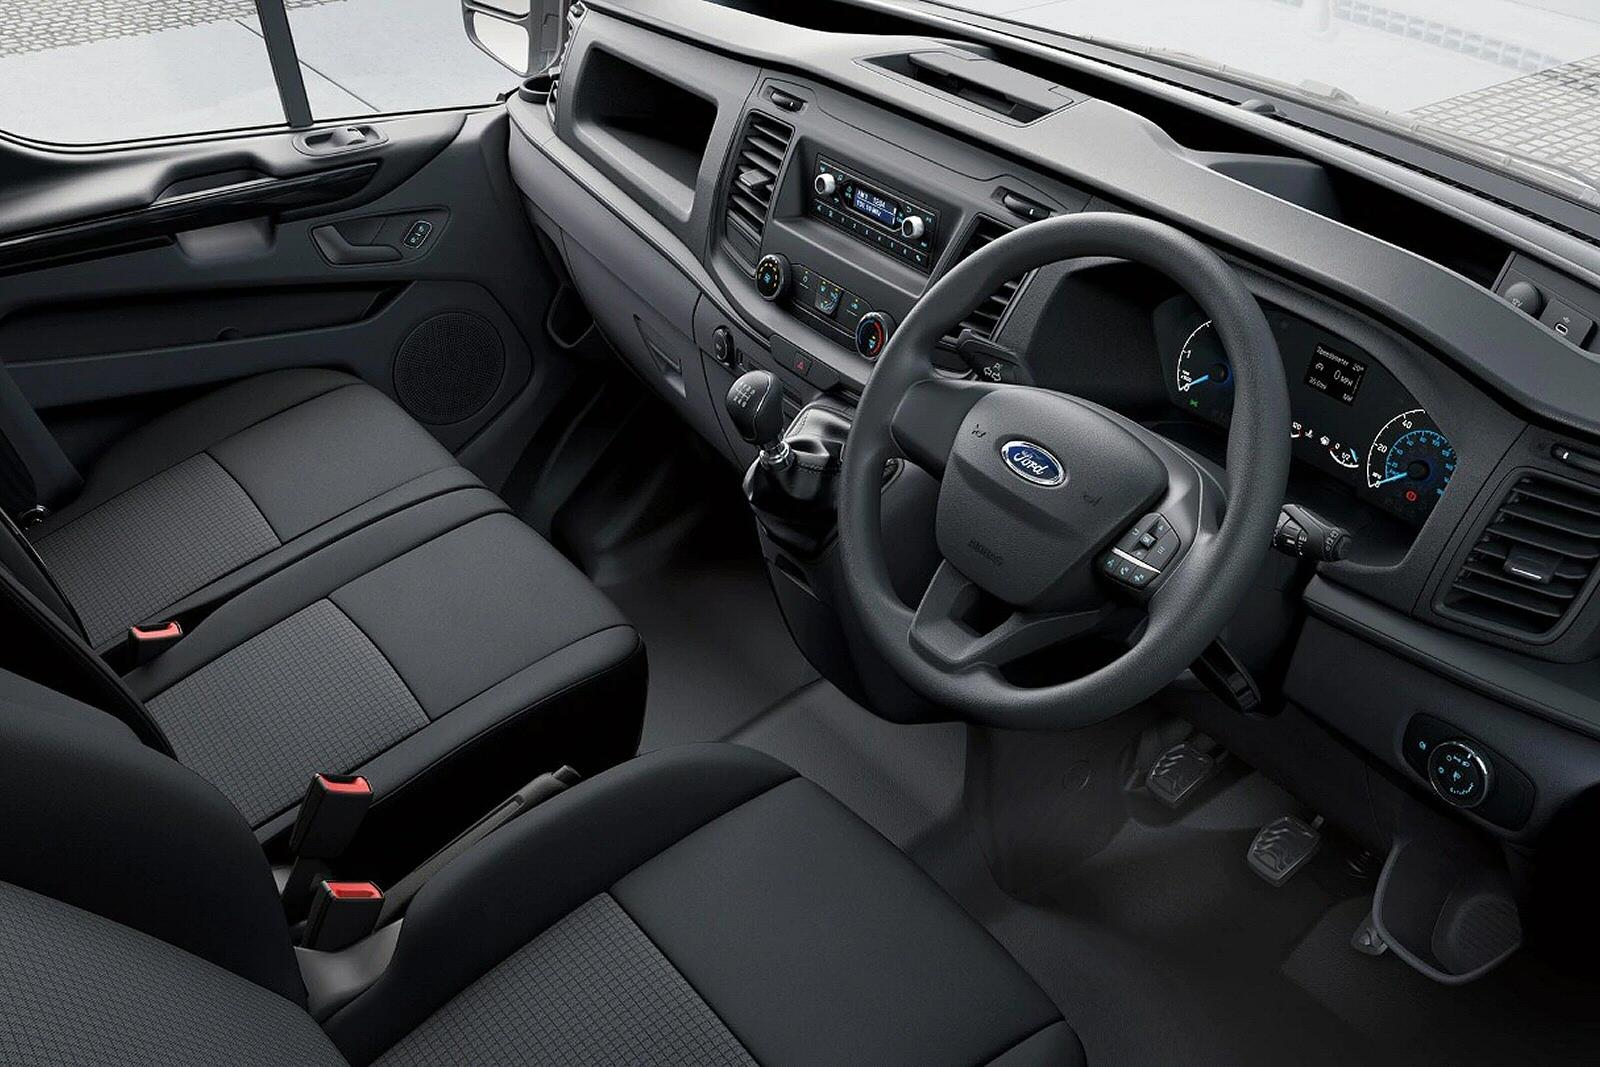 FORD TRANSIT CUSTOM 300 L1 DIESEL FWD 2.0 EcoBlue 130ps High Roof Trend Van Auto